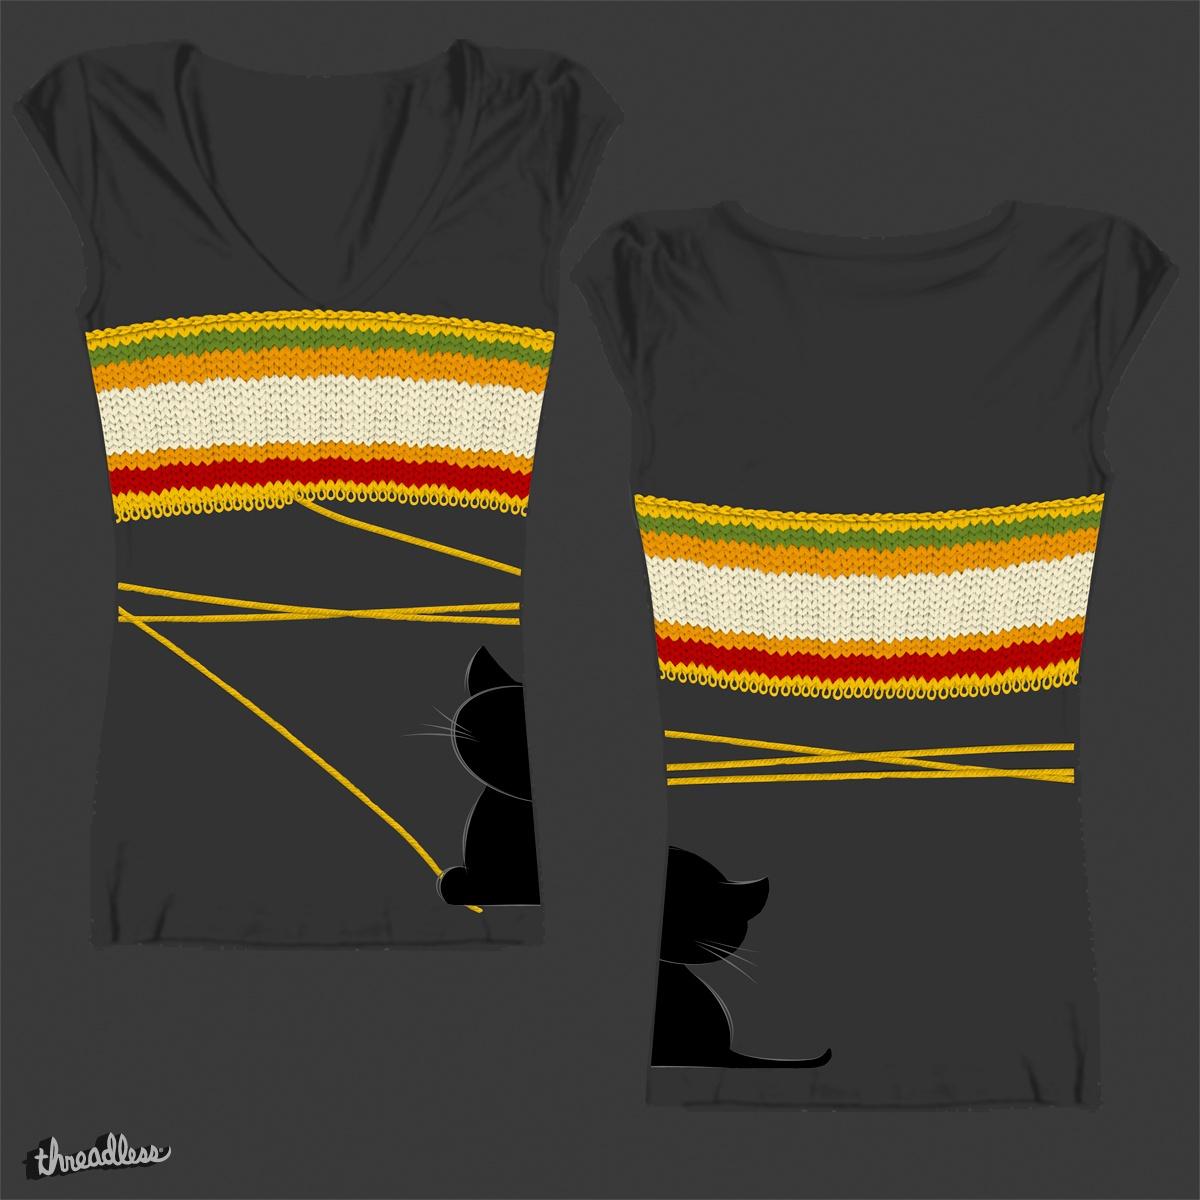 Knitty by di_di on Threadless